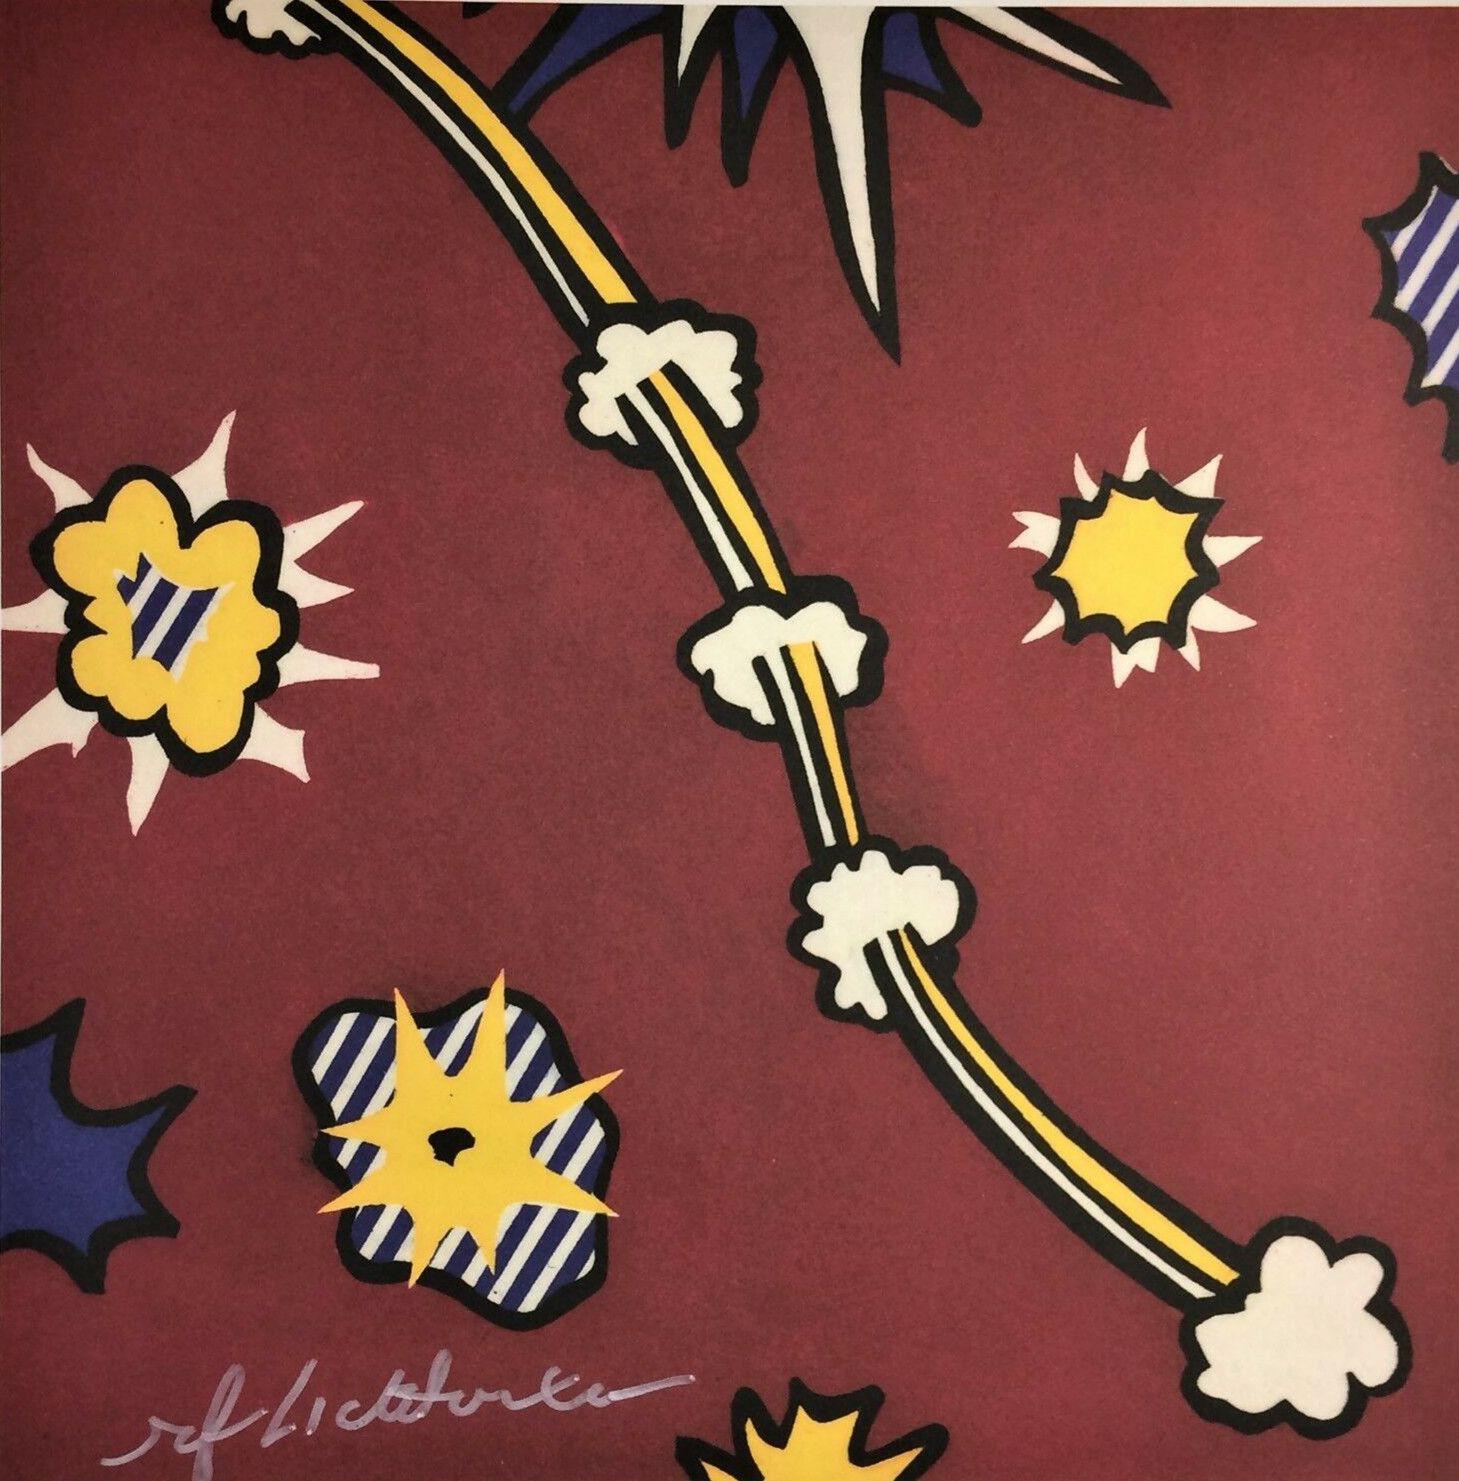 Roy Lichtenstein WHAAM Home Decor Artisanats / HD huile d'impression Peinture Sur Toile Art mur toile Photos 7524